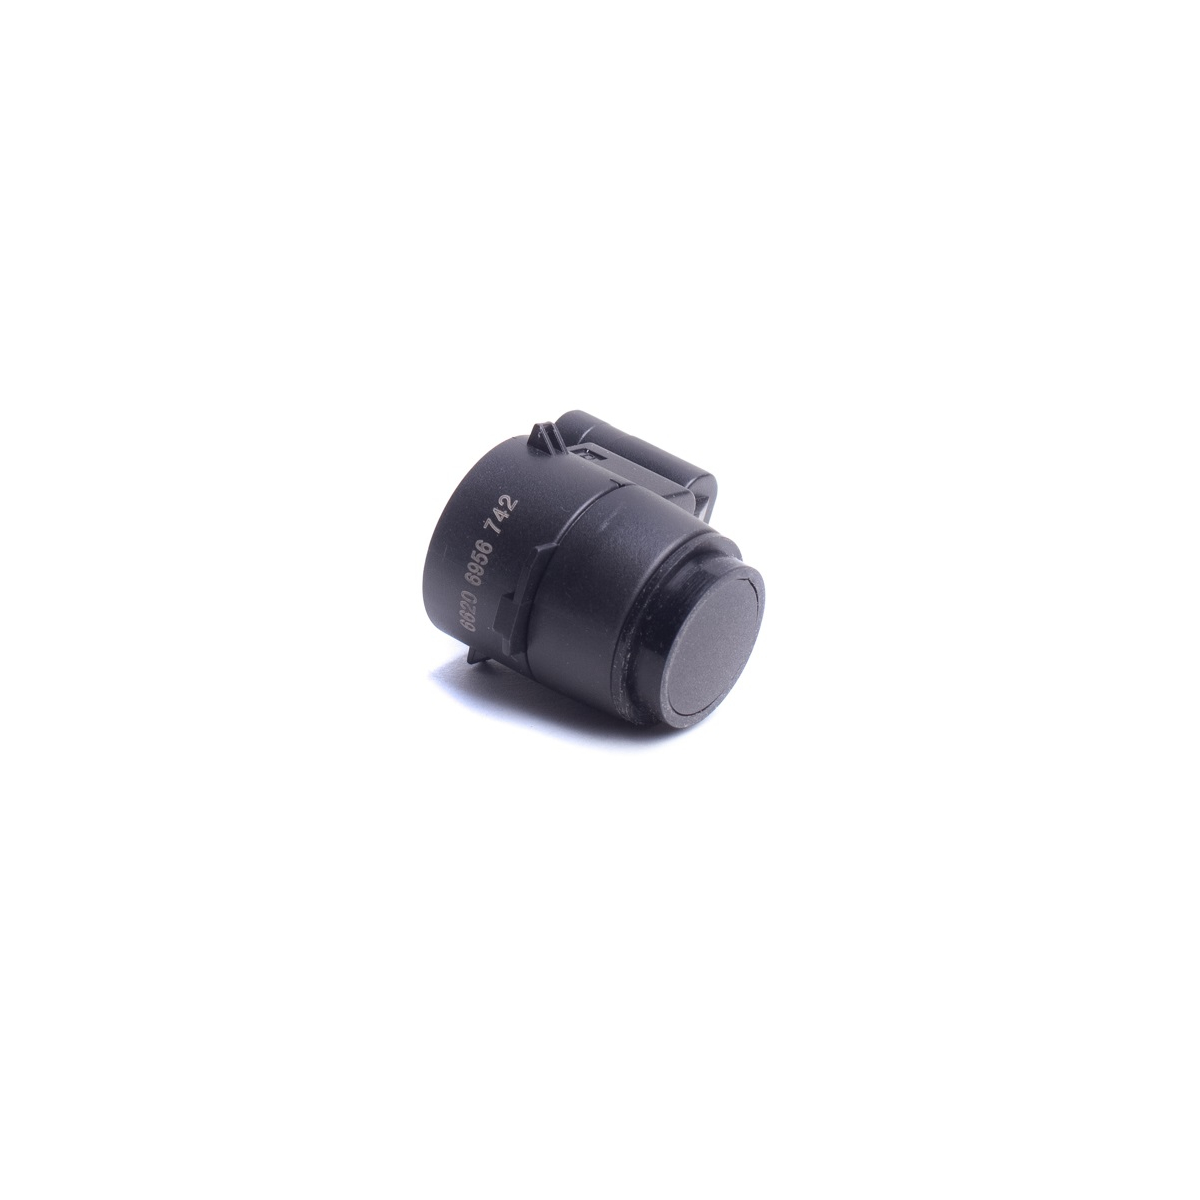 Parking sensor 66206956742 for BMW PDC Parktronic